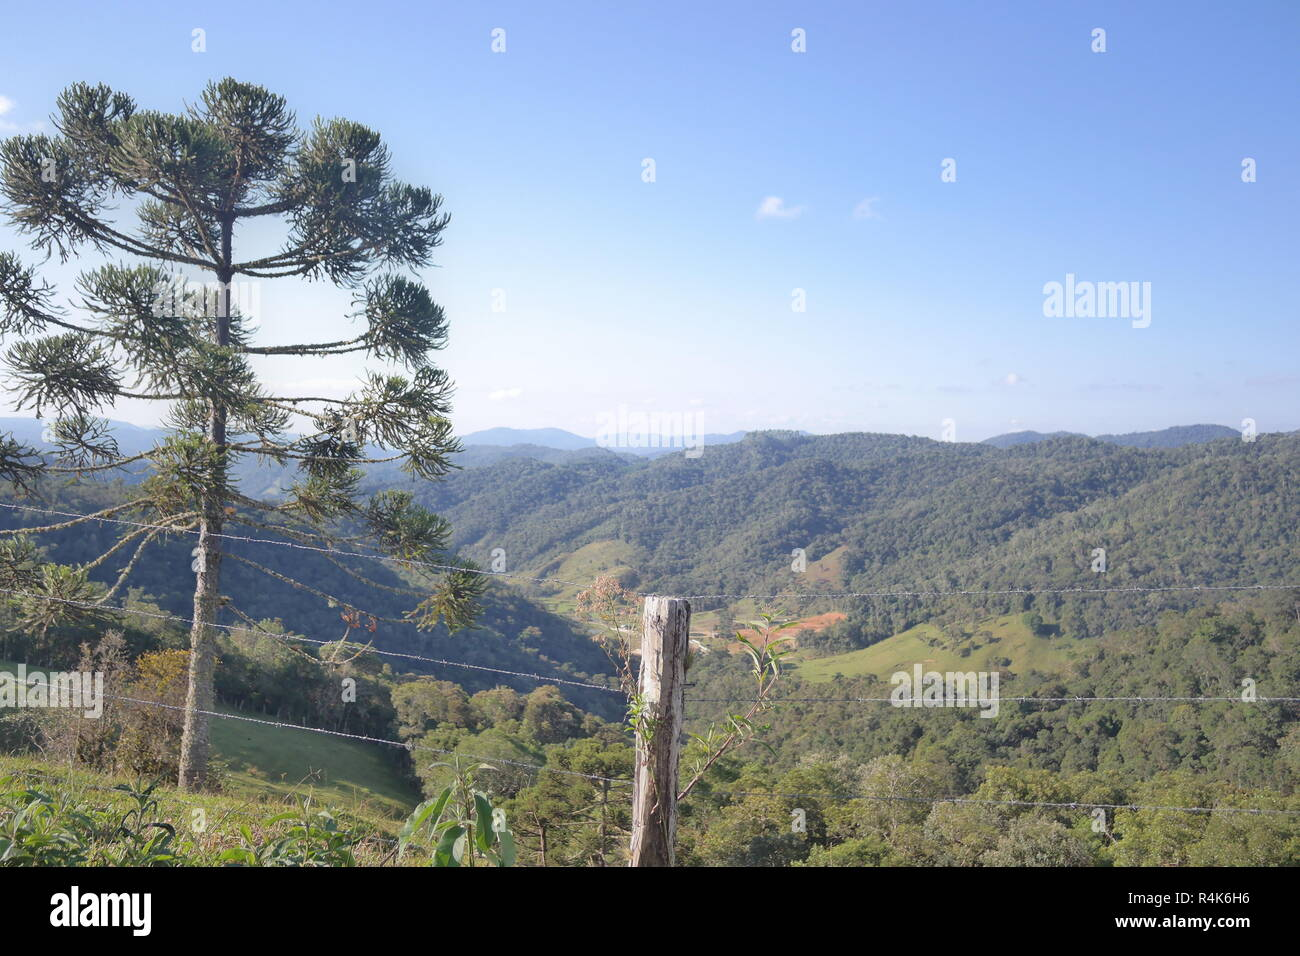 Serra Catarinense, Rancho queimado, Autunno, Inverno Santa Catarina, Brasile Immagini Stock